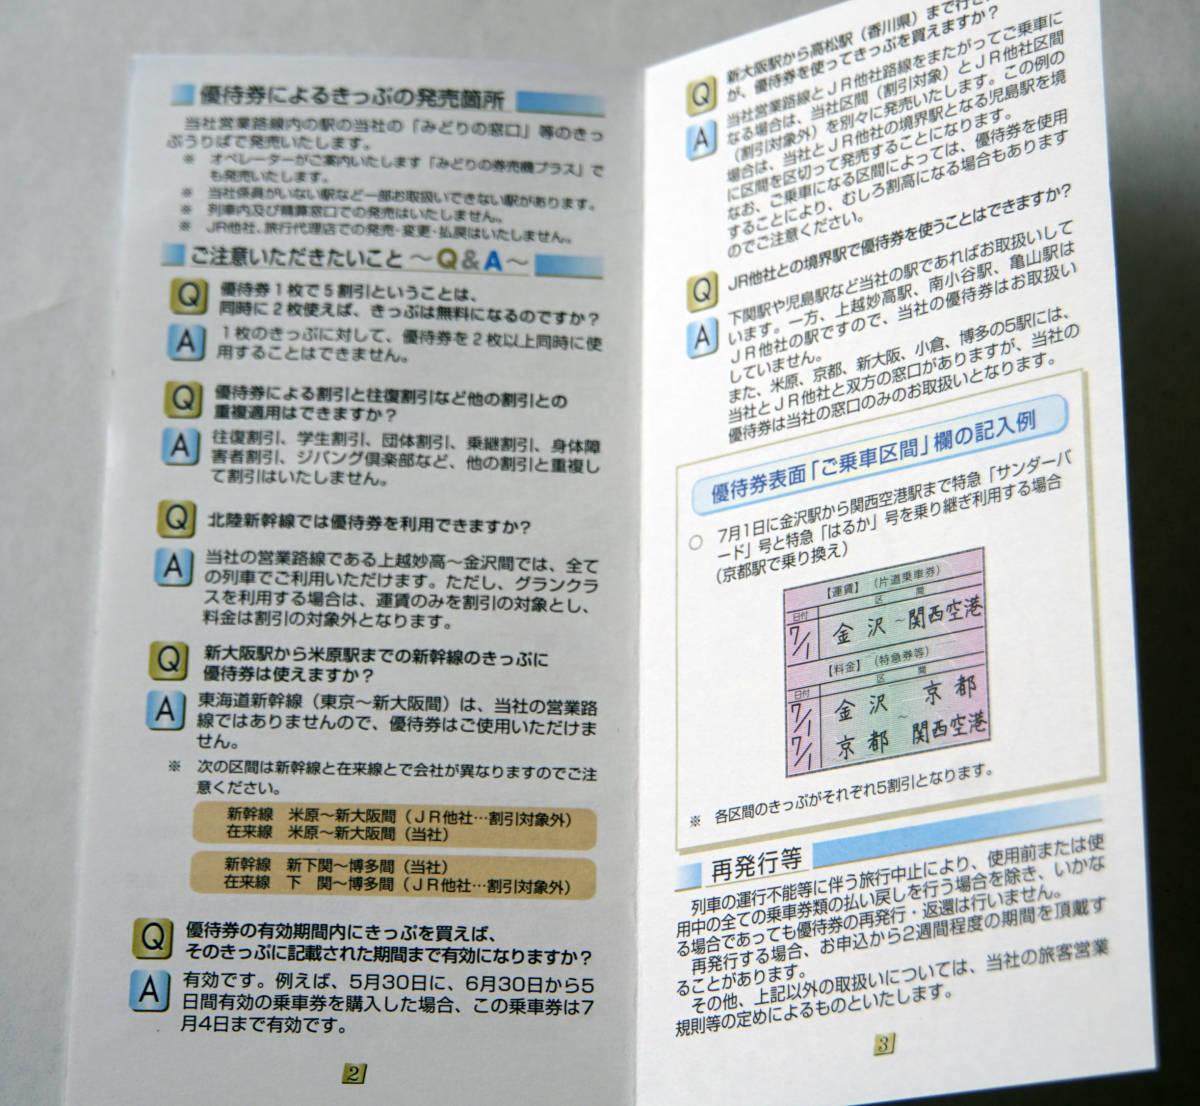 JR西日本 株主優待鉄道割引券 X10枚+三越百貨店、ホテル・レストランなど割引券 有効期限 2022年5月31日まで_画像6